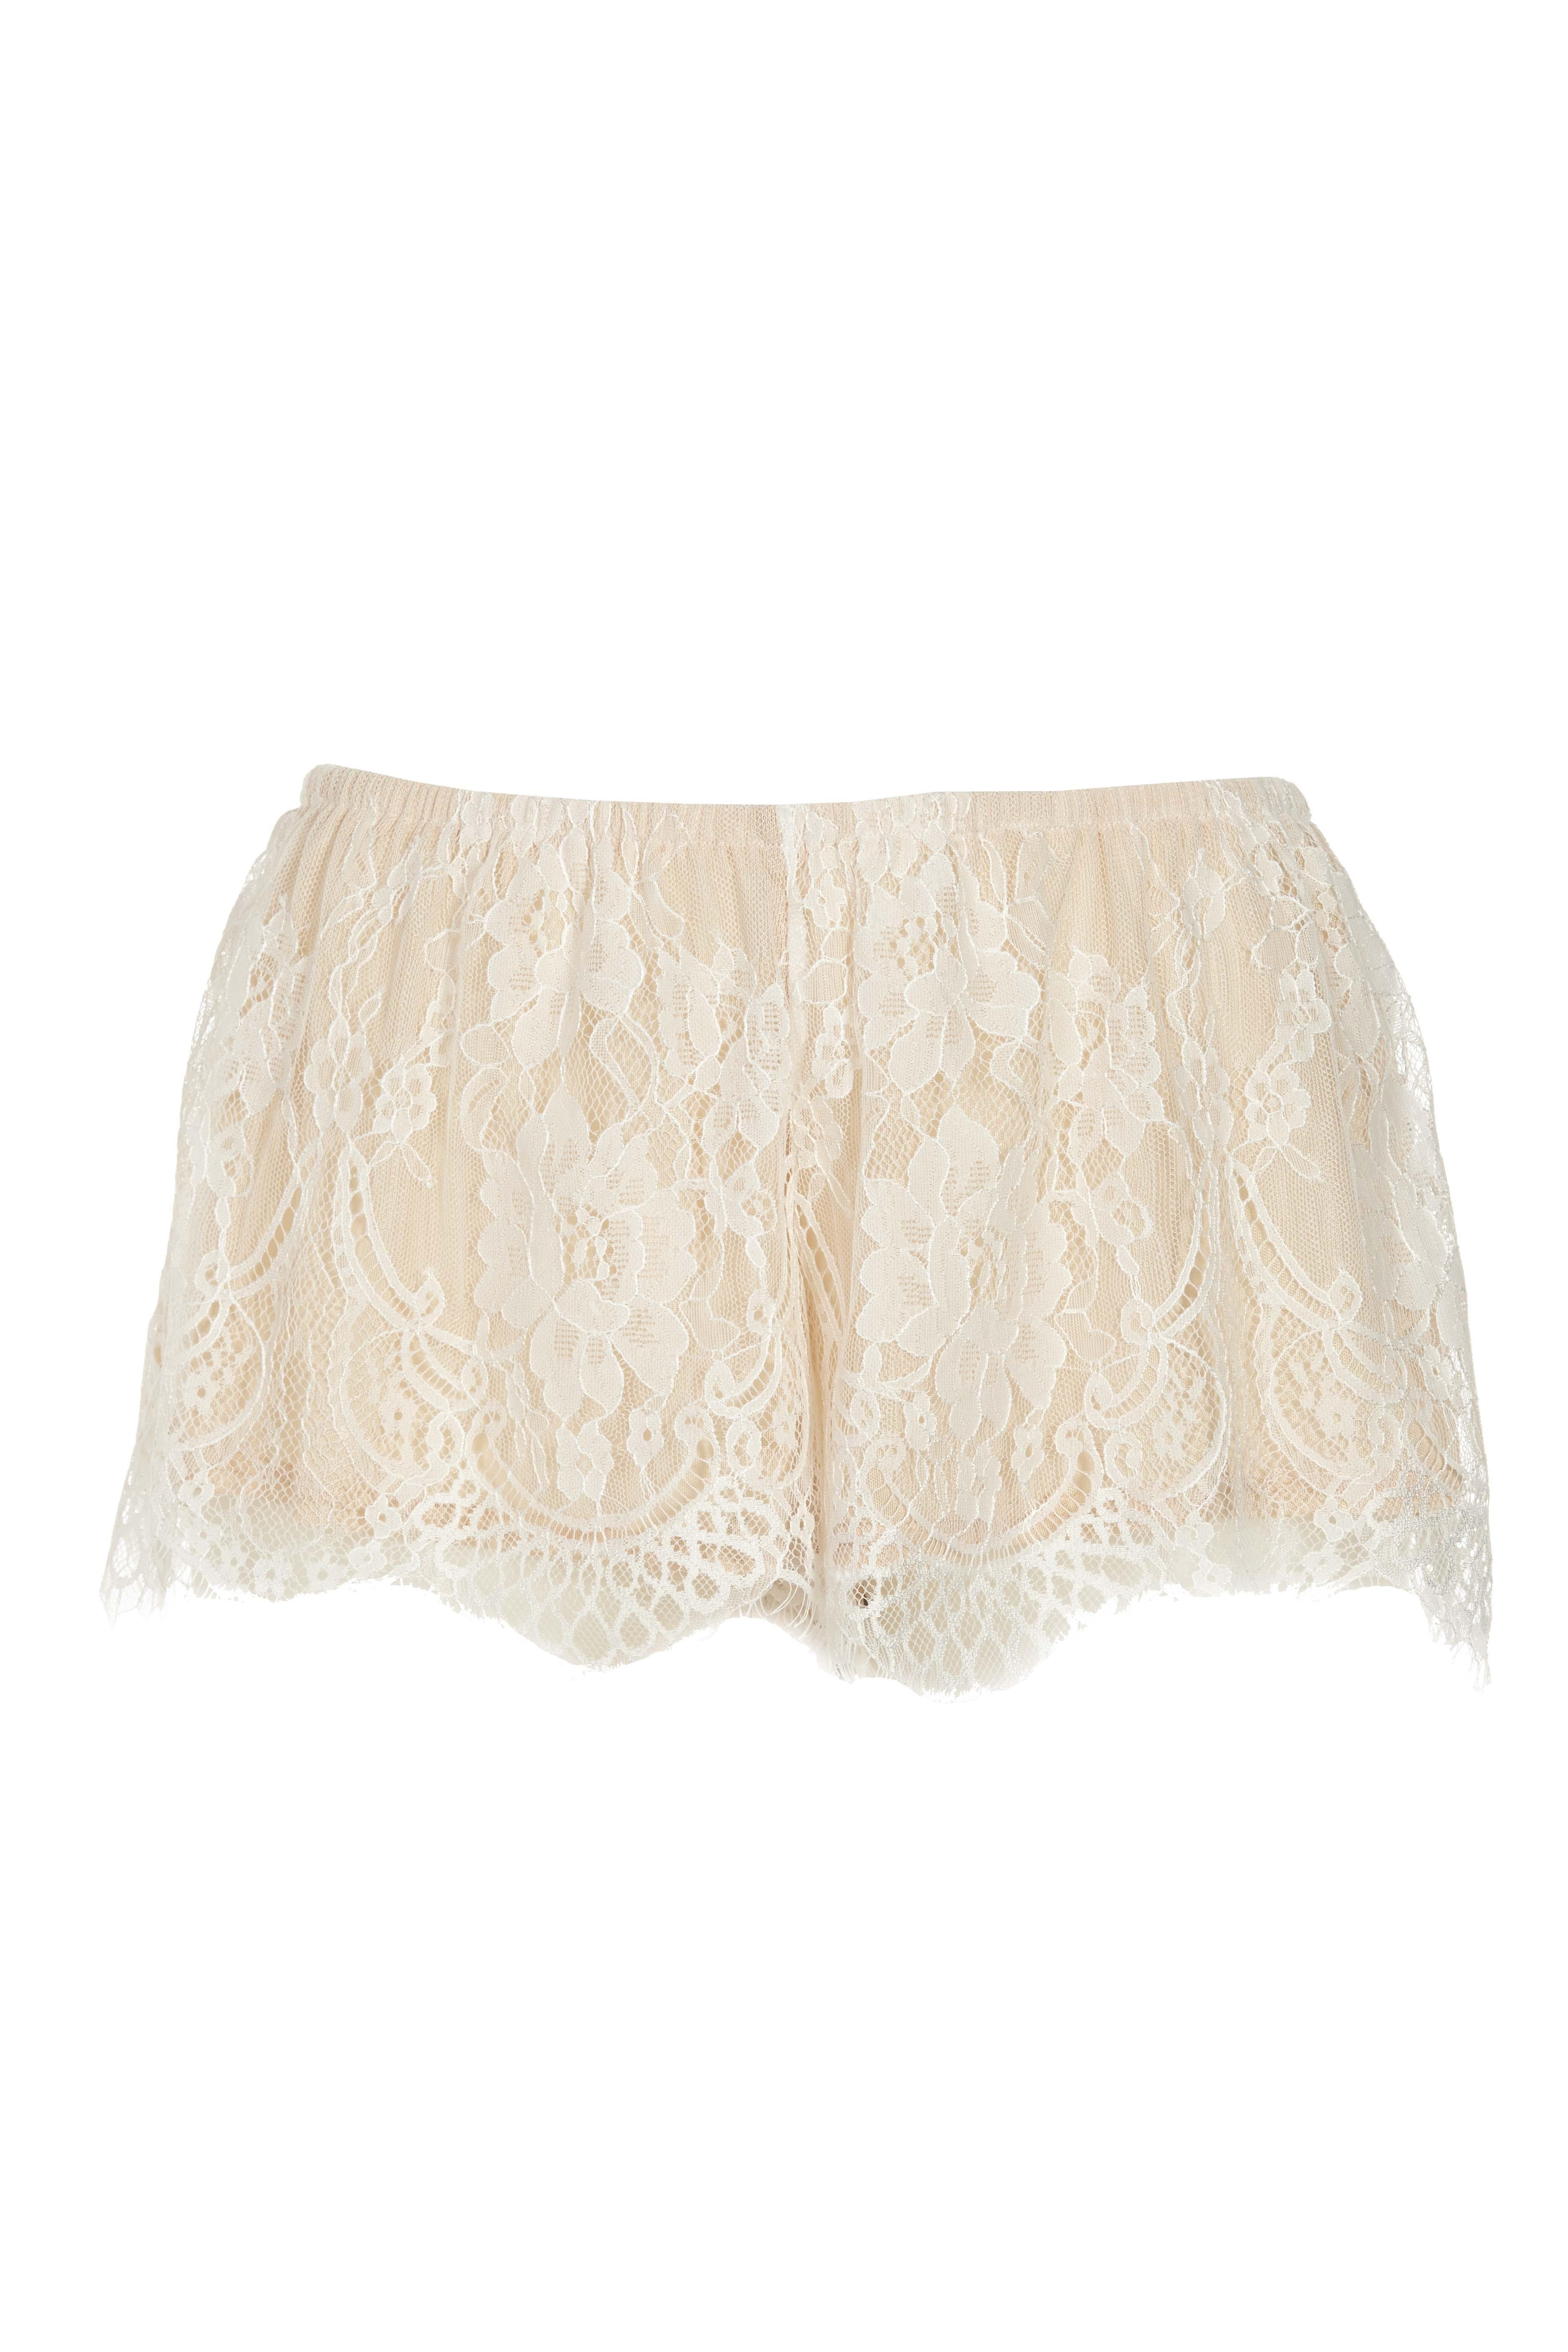 cotton-on-body_bridal-lace-shortie_nz34-95_oct-nov-dec